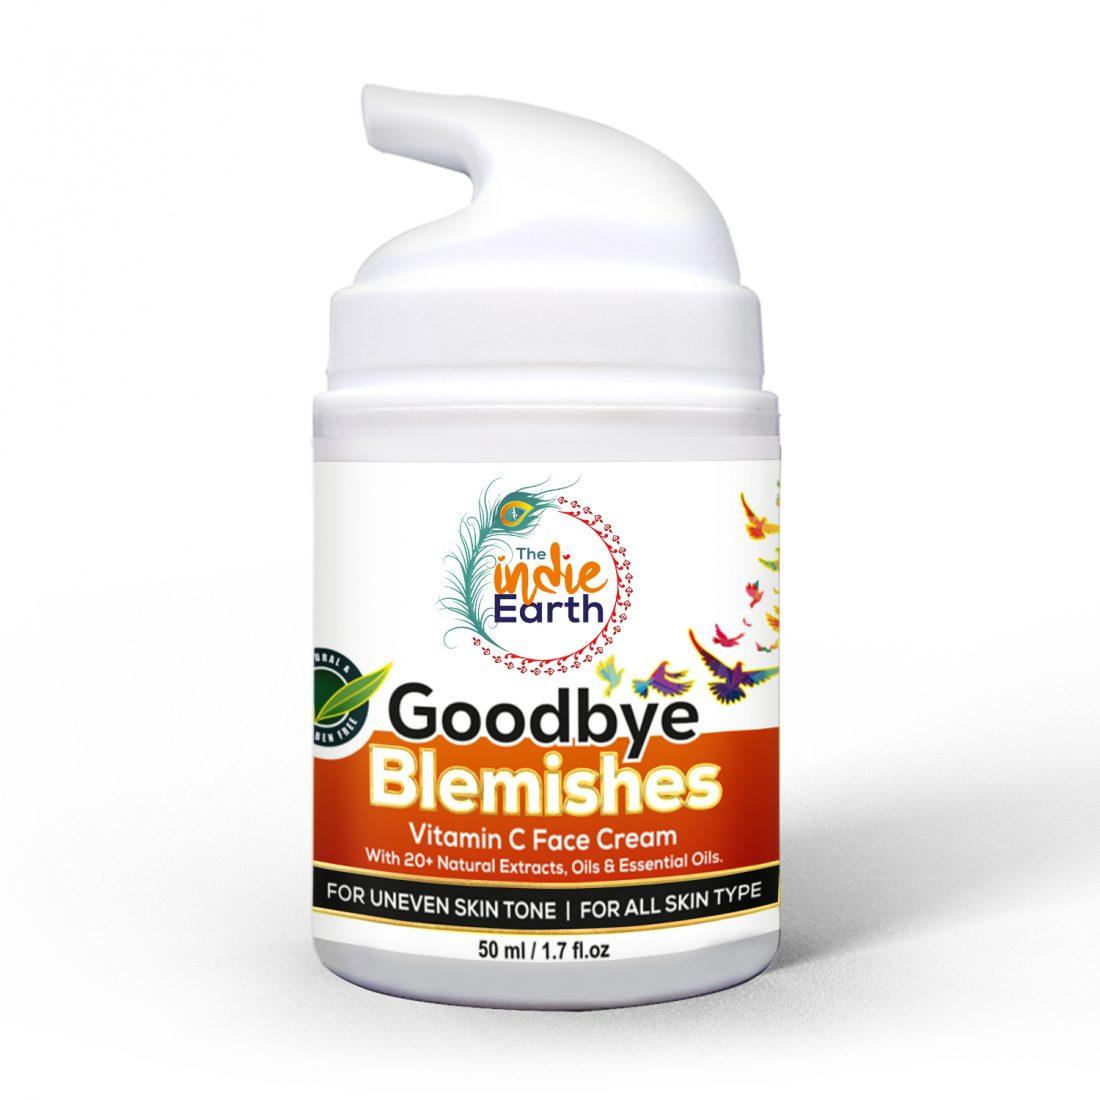 Goodbye-Blemishes-Vitamin-C-Face-Cream